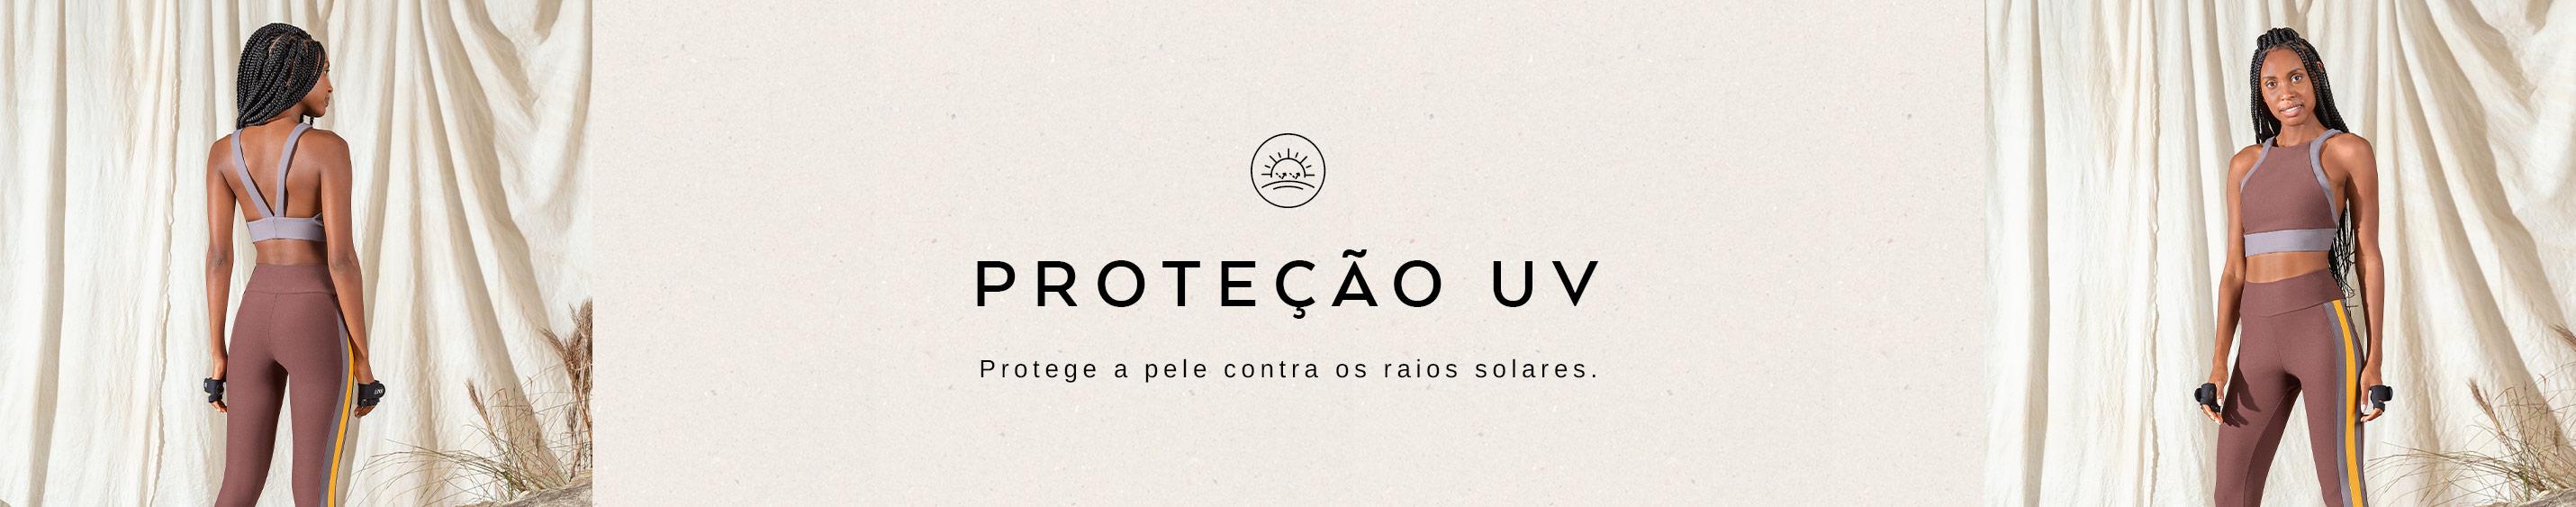 banner_protecao_uv50